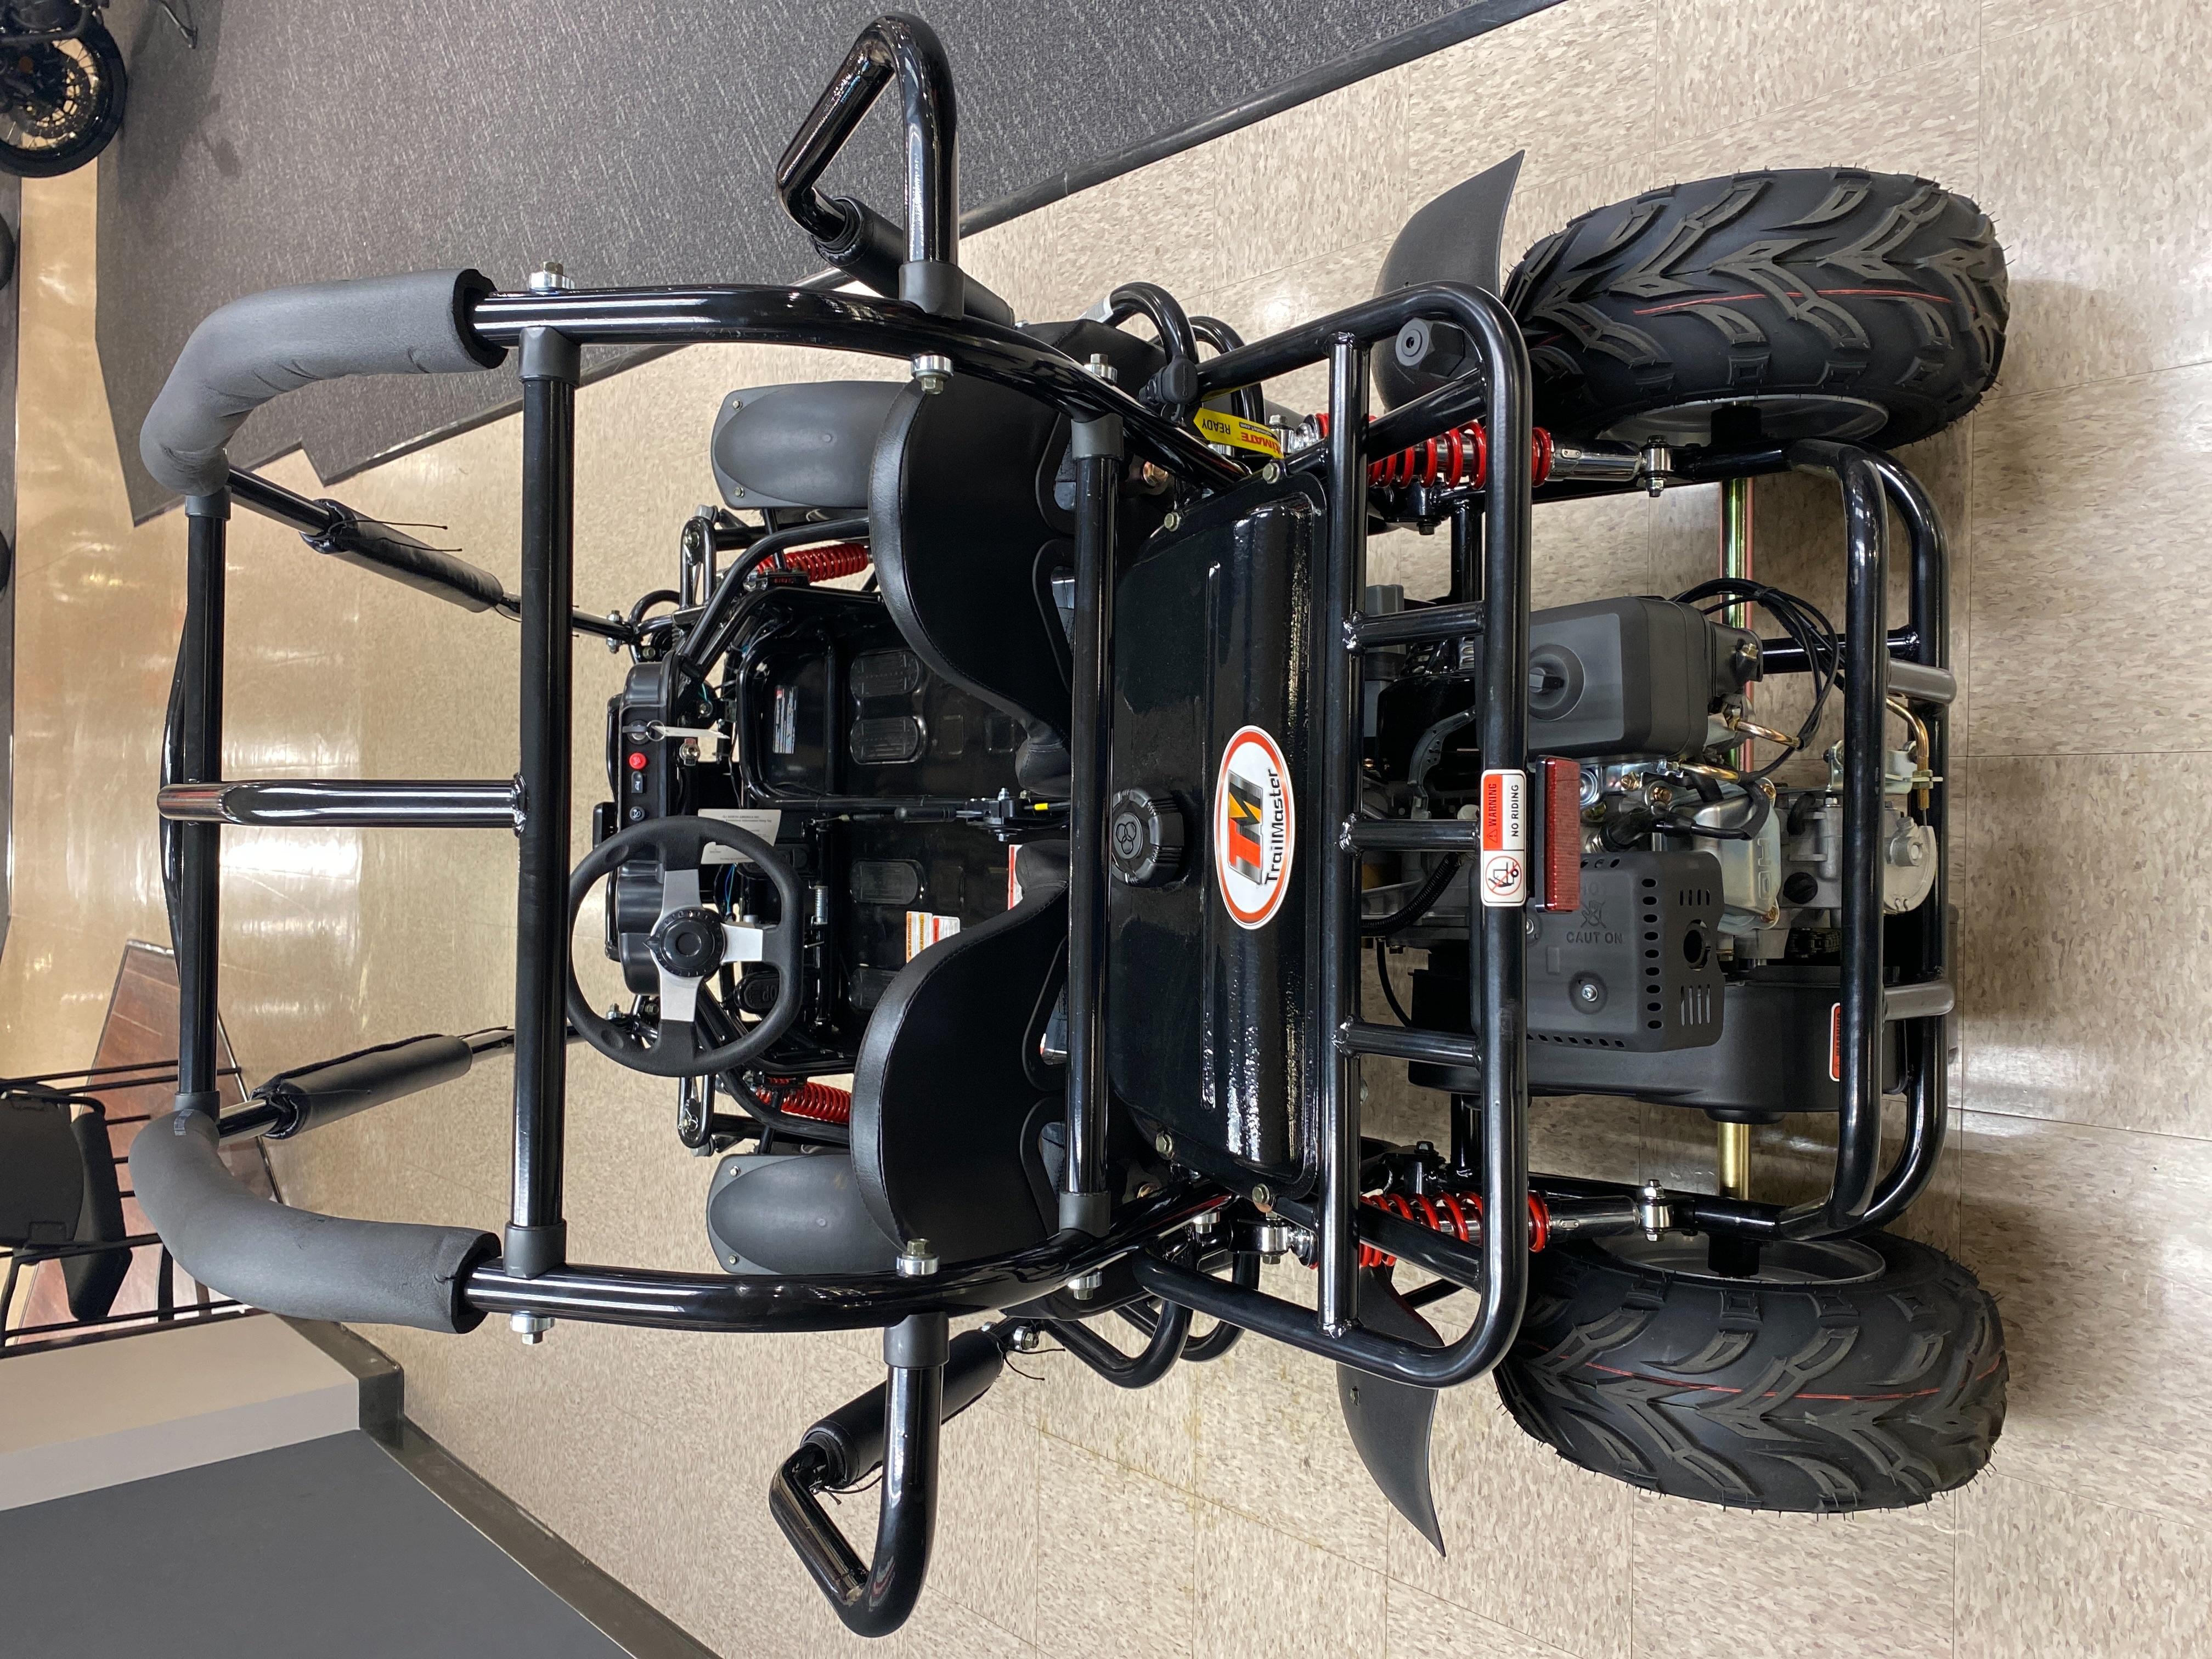 2021 Trail Master Karts MID XRXR-BLK MID XRX/R-BLK at Sloans Motorcycle ATV, Murfreesboro, TN, 37129